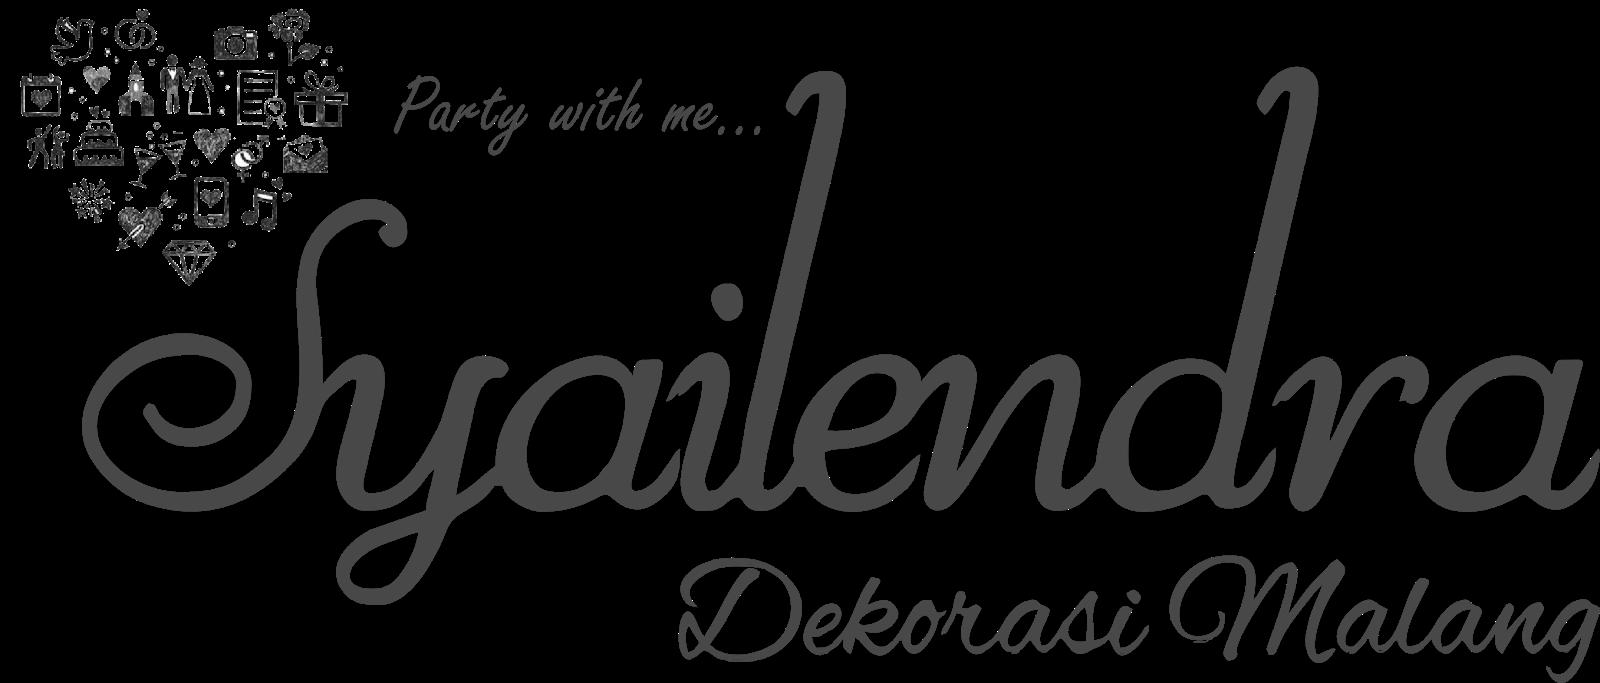 SYAILENDRA DEKORASI | DEKORASI MALANG | DEKORASI PERNIKAHAN MALANG | DEKORASI ULANG TAHUN |